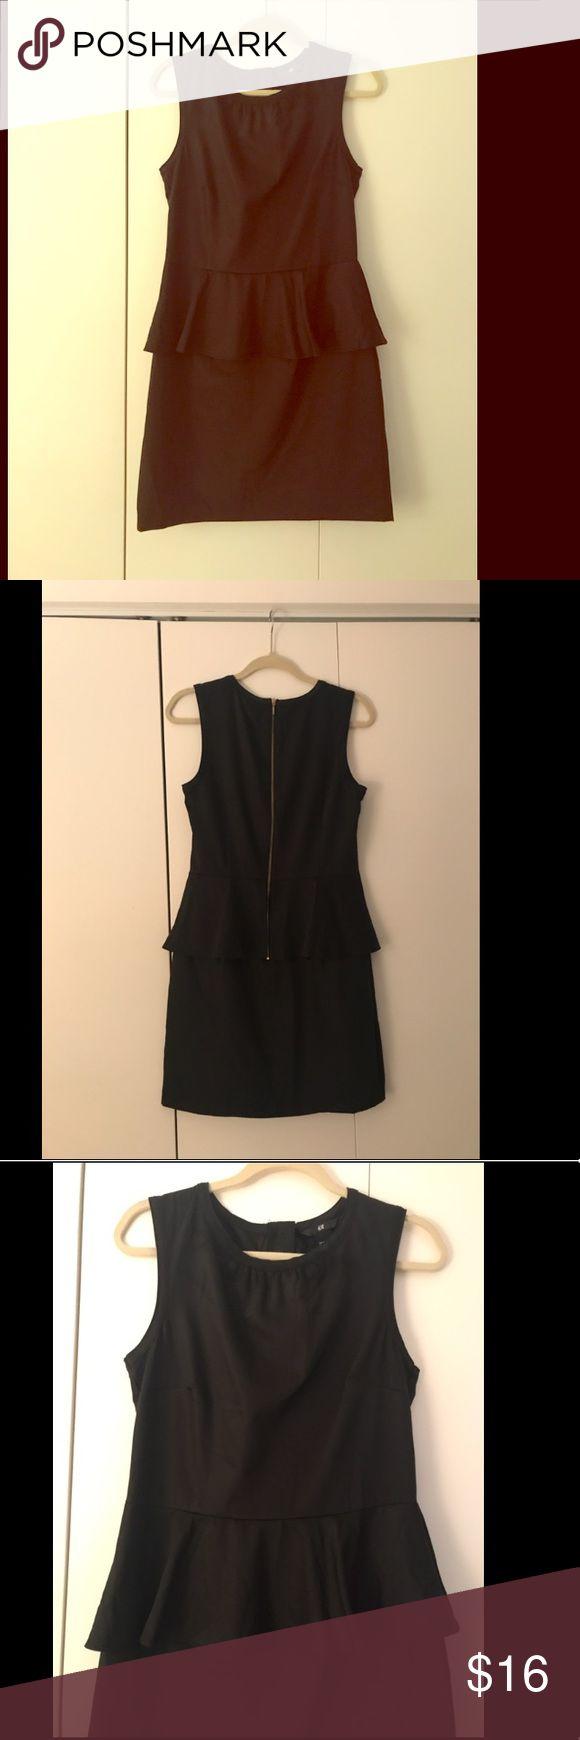 Black Peplum Dress Black peplum dress. New with tags. Never worn, zipper back. Gorgeous fit. H&M Dresses Midi